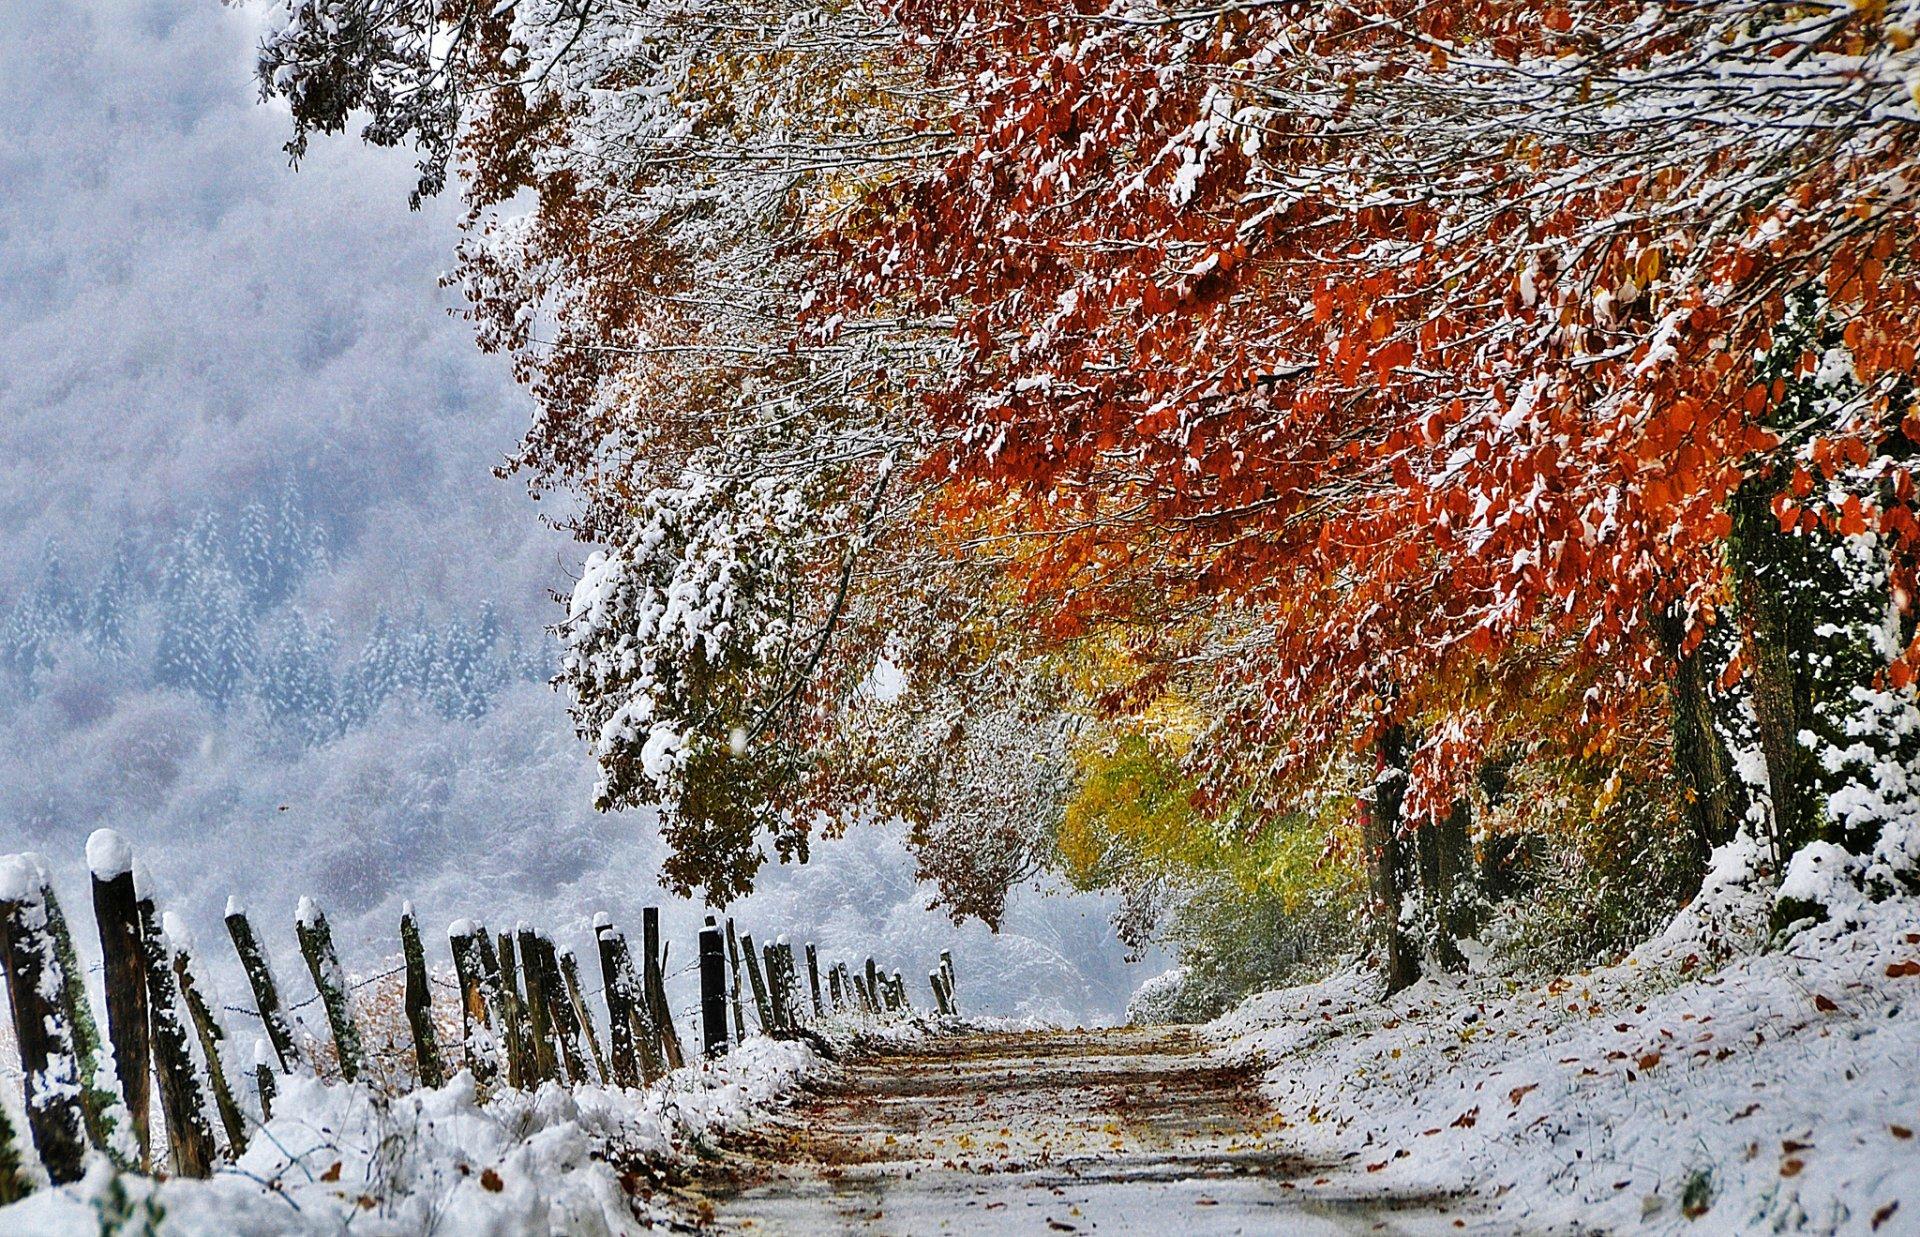 картинки на рабочий стол поздняя осень пейзажи